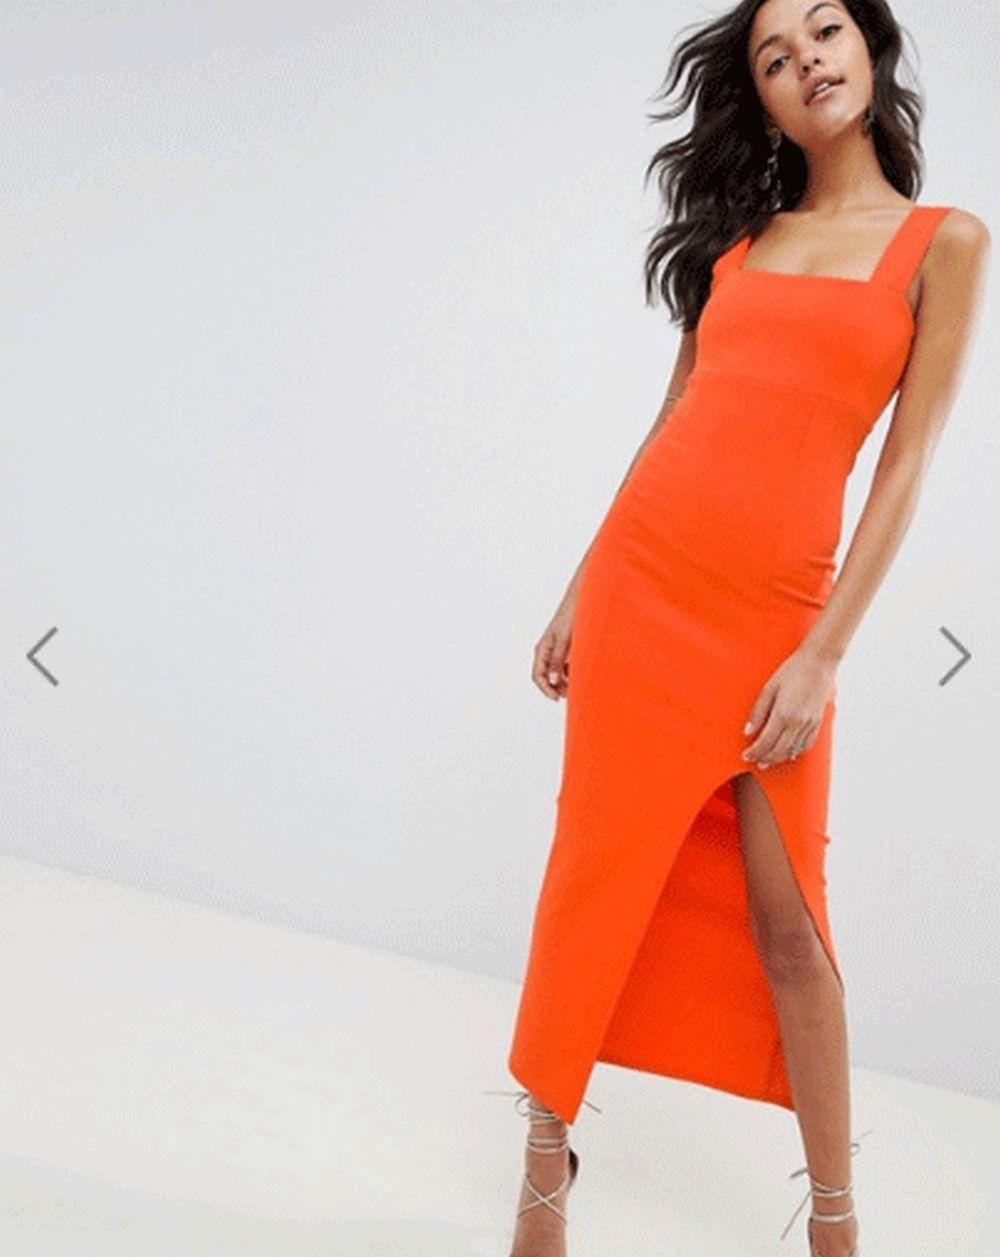 Vestido naranja ajustado, de Asos.